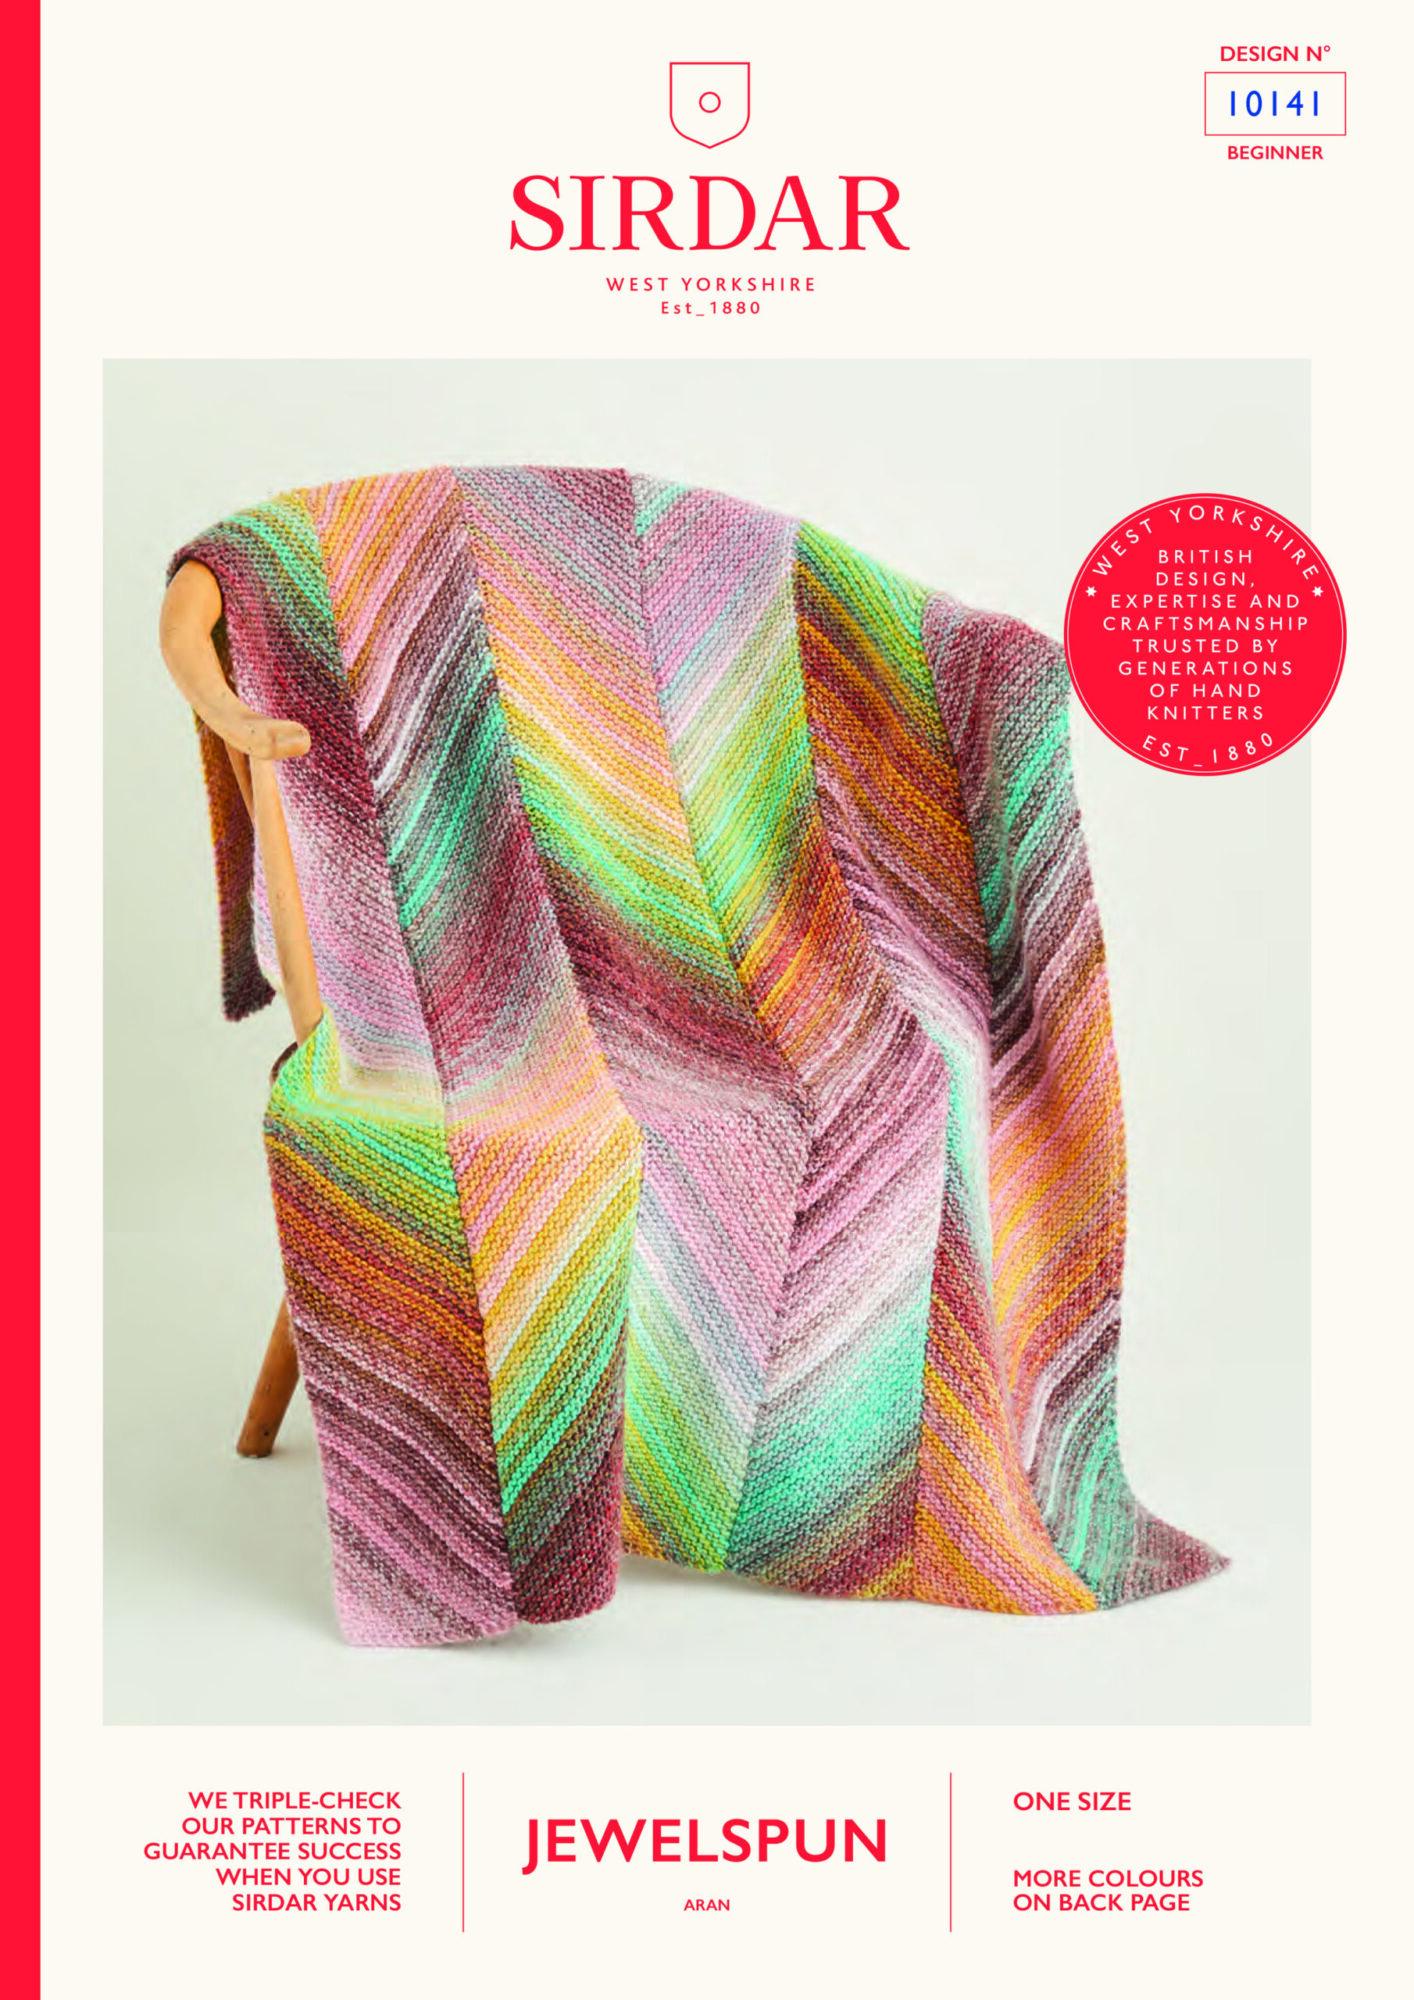 Sirdar Pattern Jewelspun  10141 (Download) product image